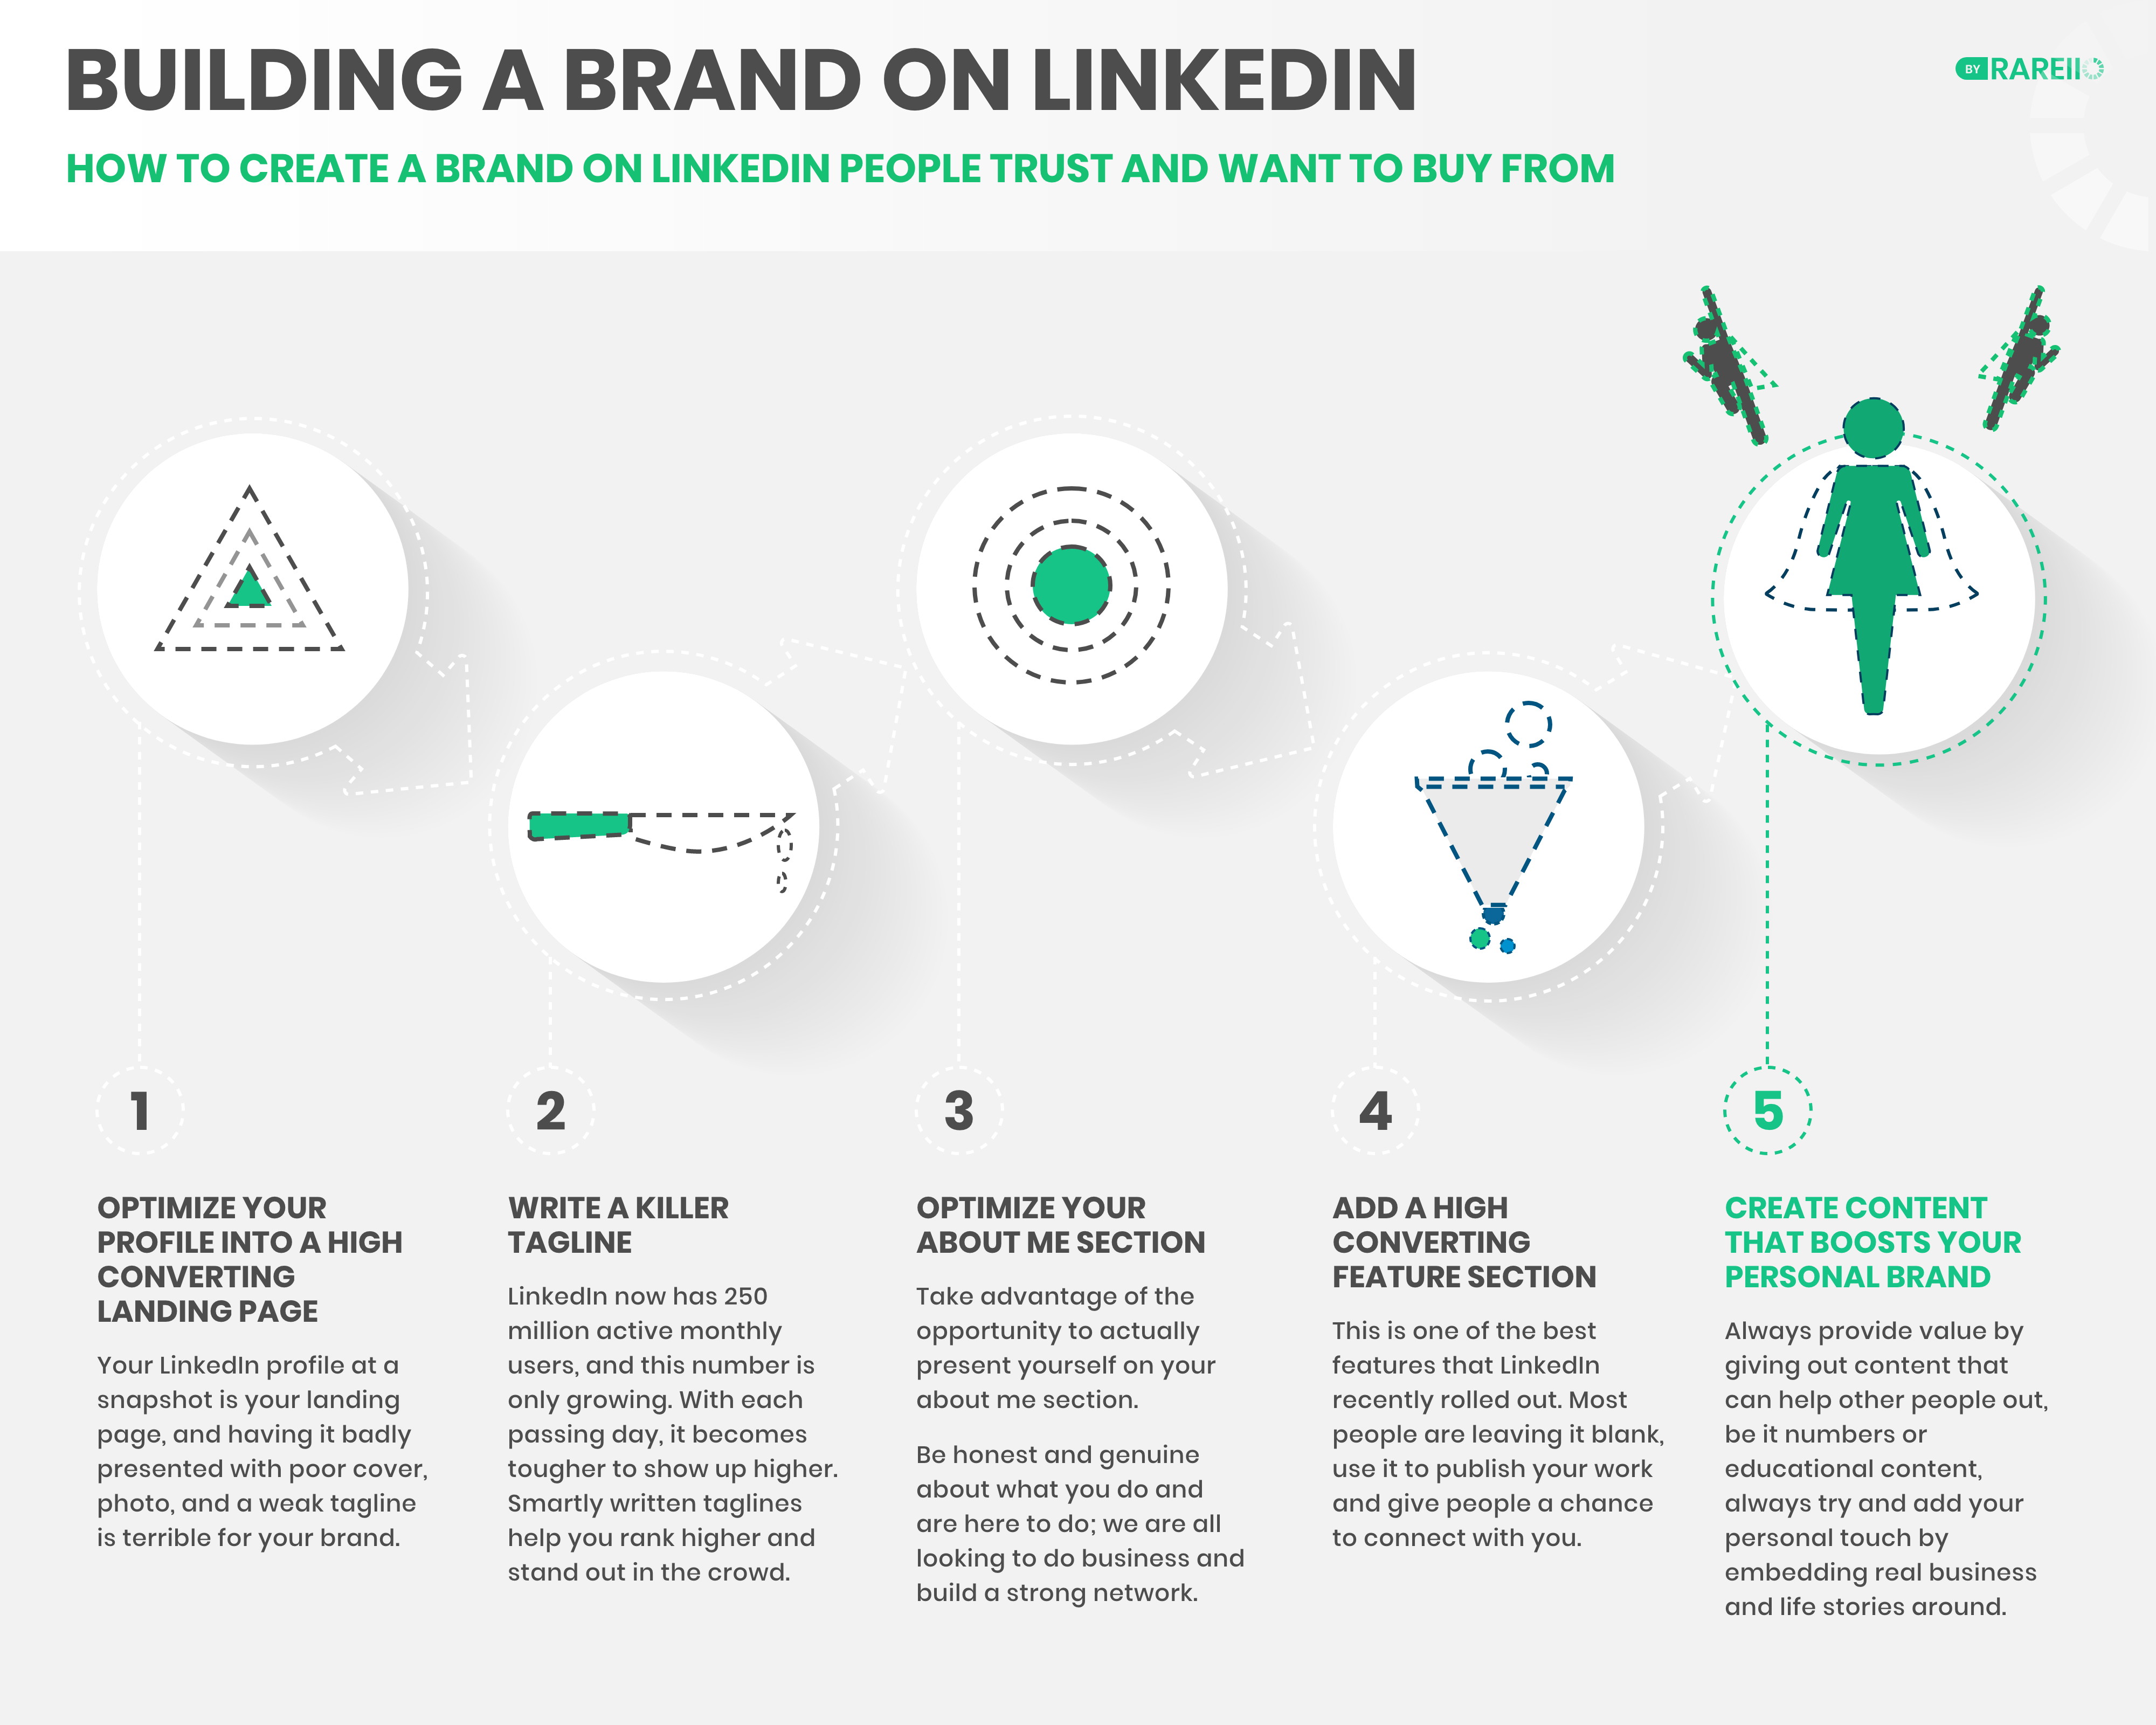 How to create a brand on LinkedIn